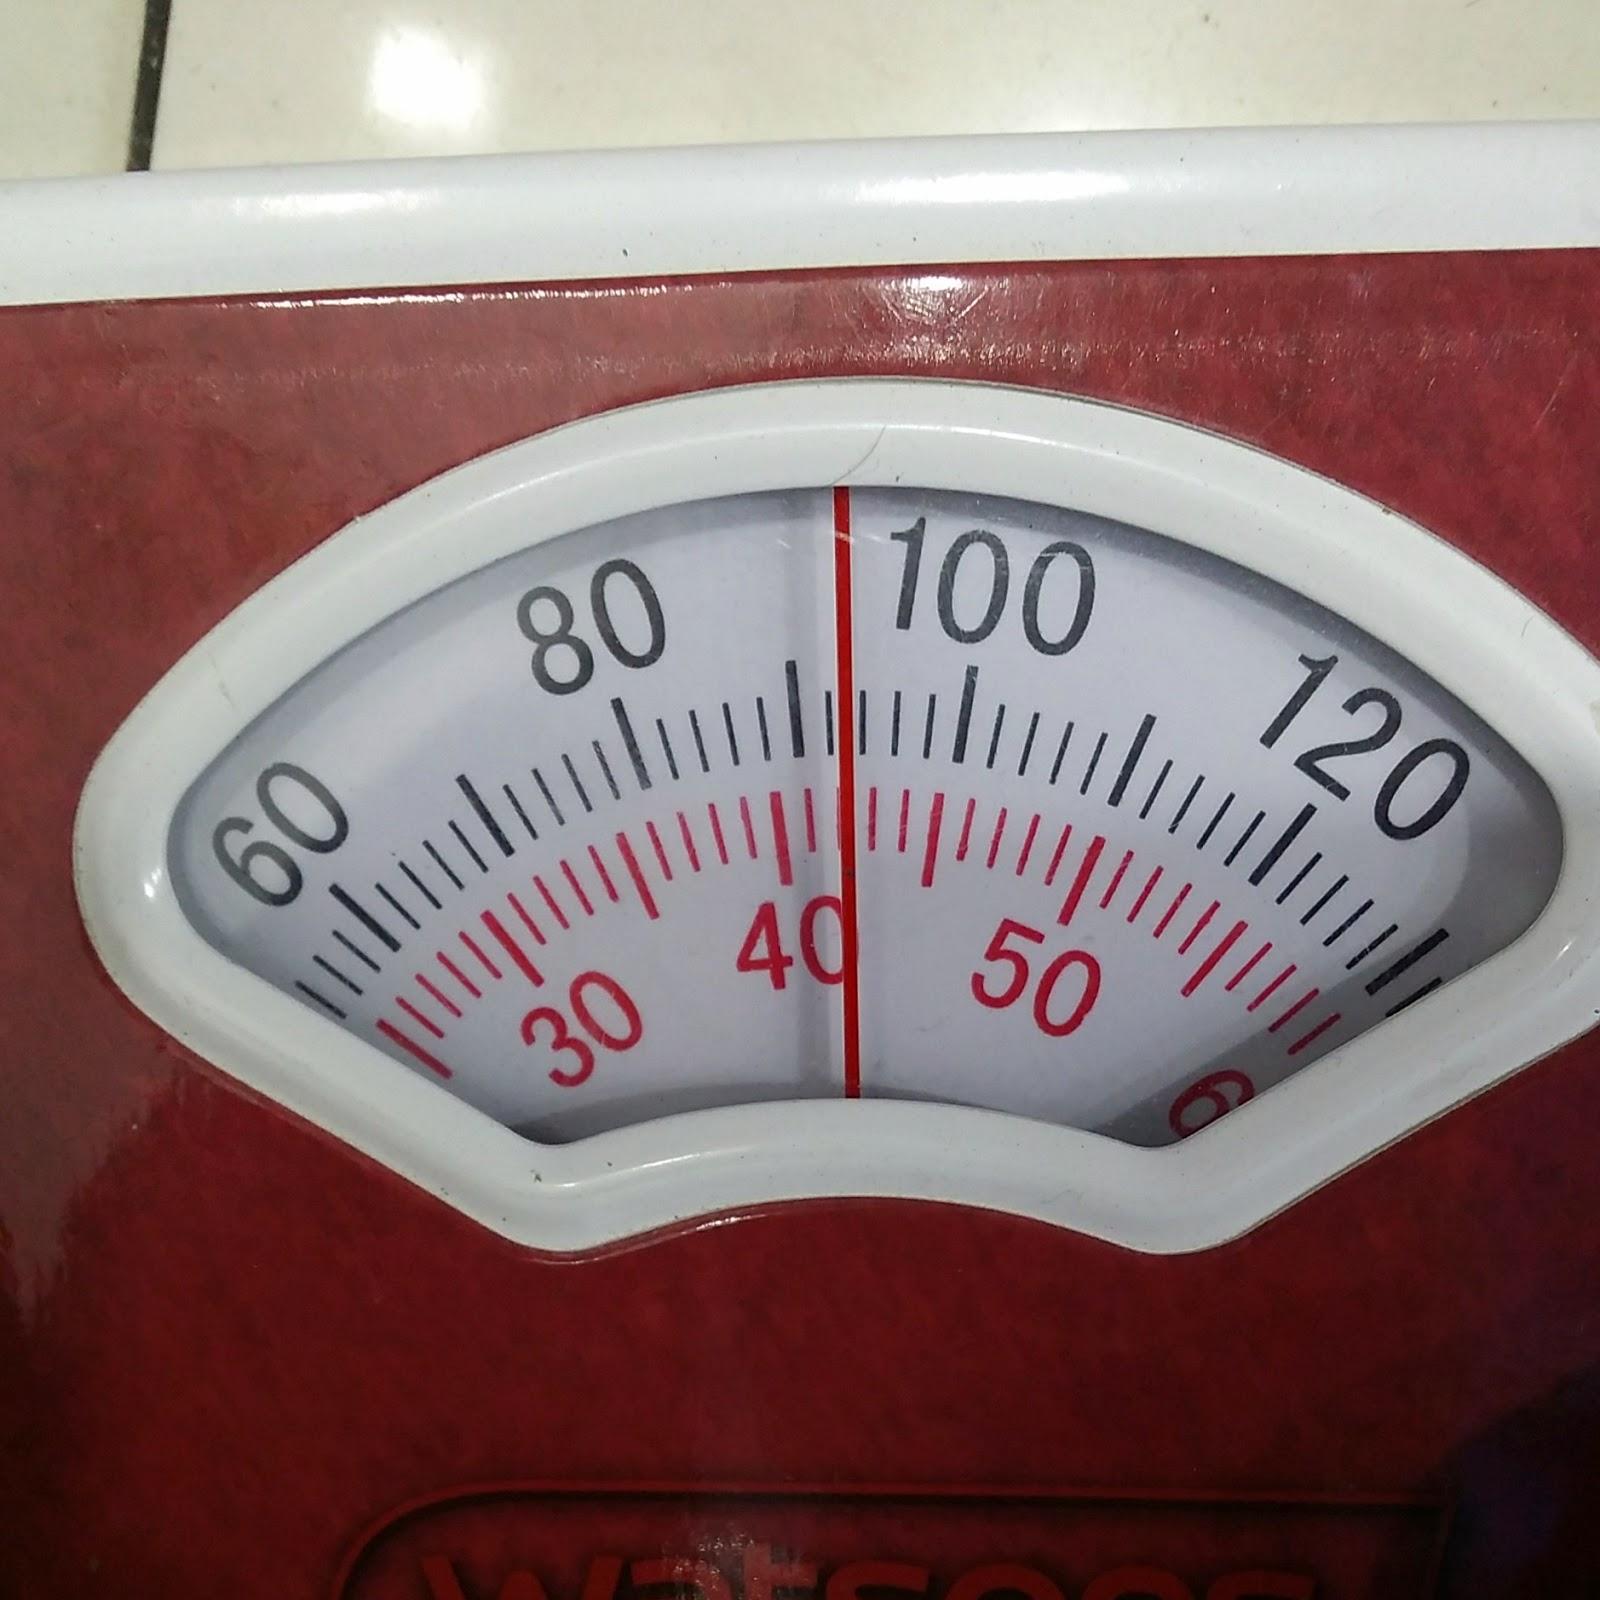 Cara mengurangi berat badan gimana y?